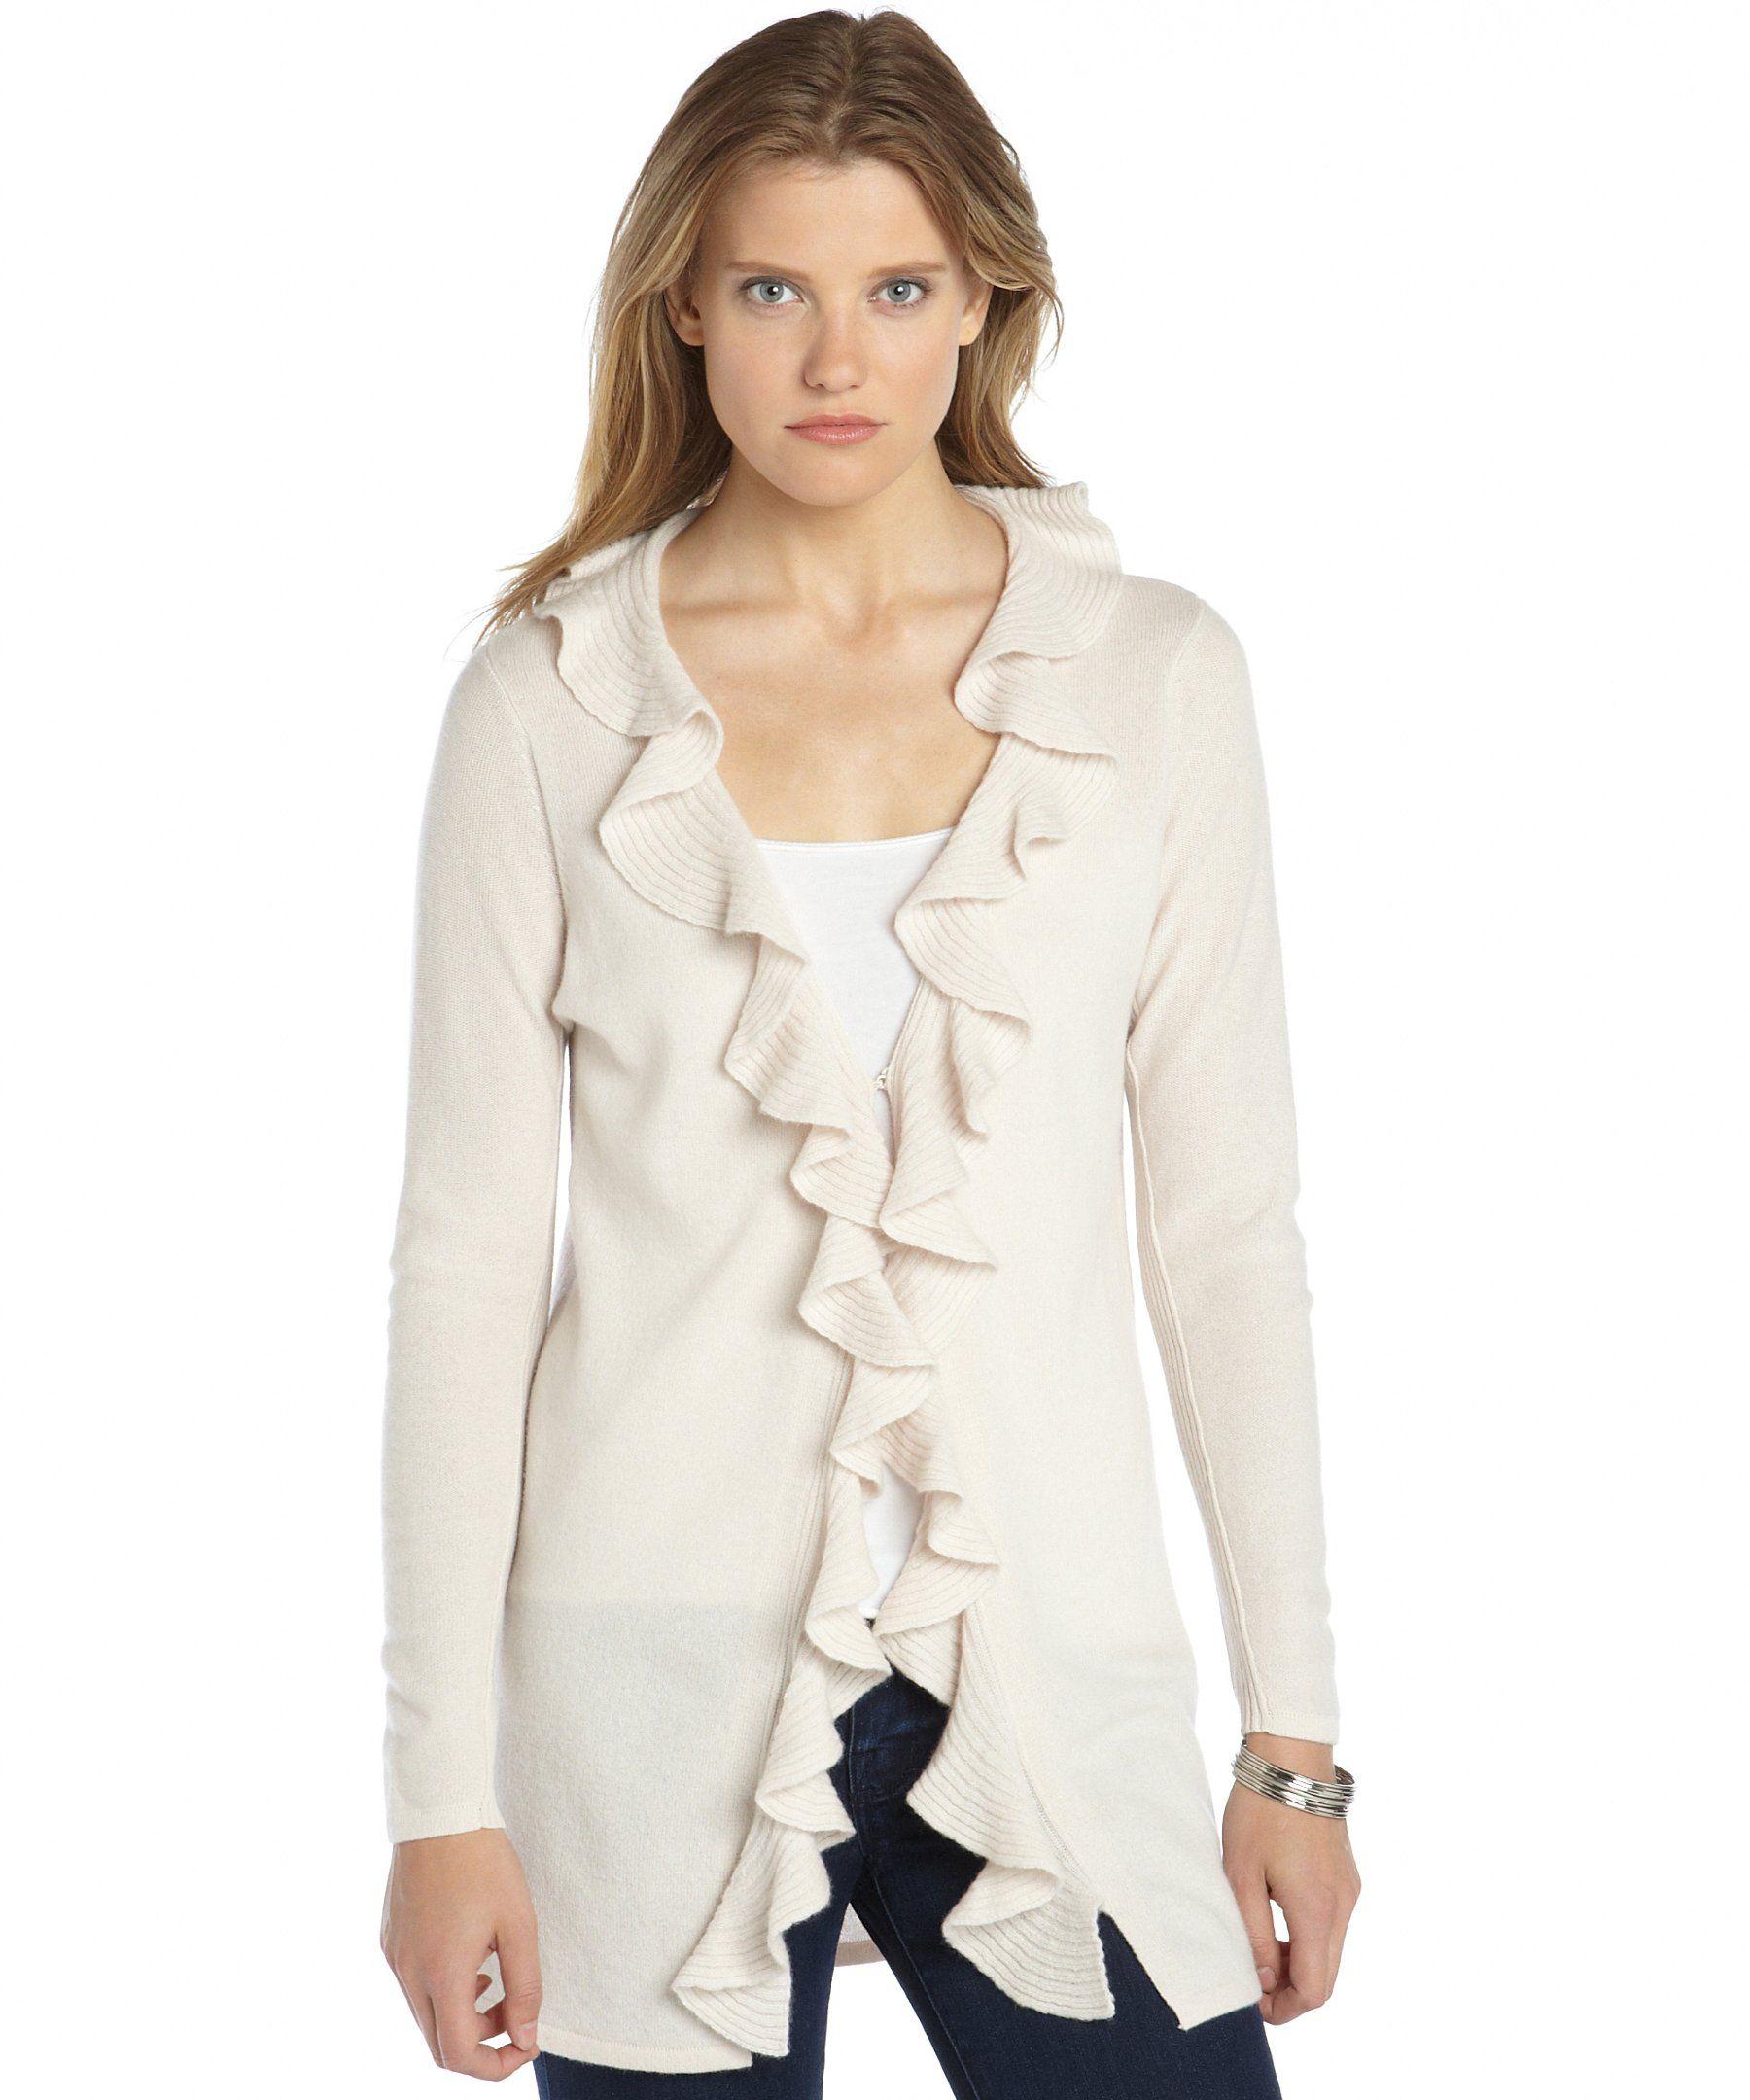 Magaschoni ivory cashmere knit ruffle front cardigan sweater ...